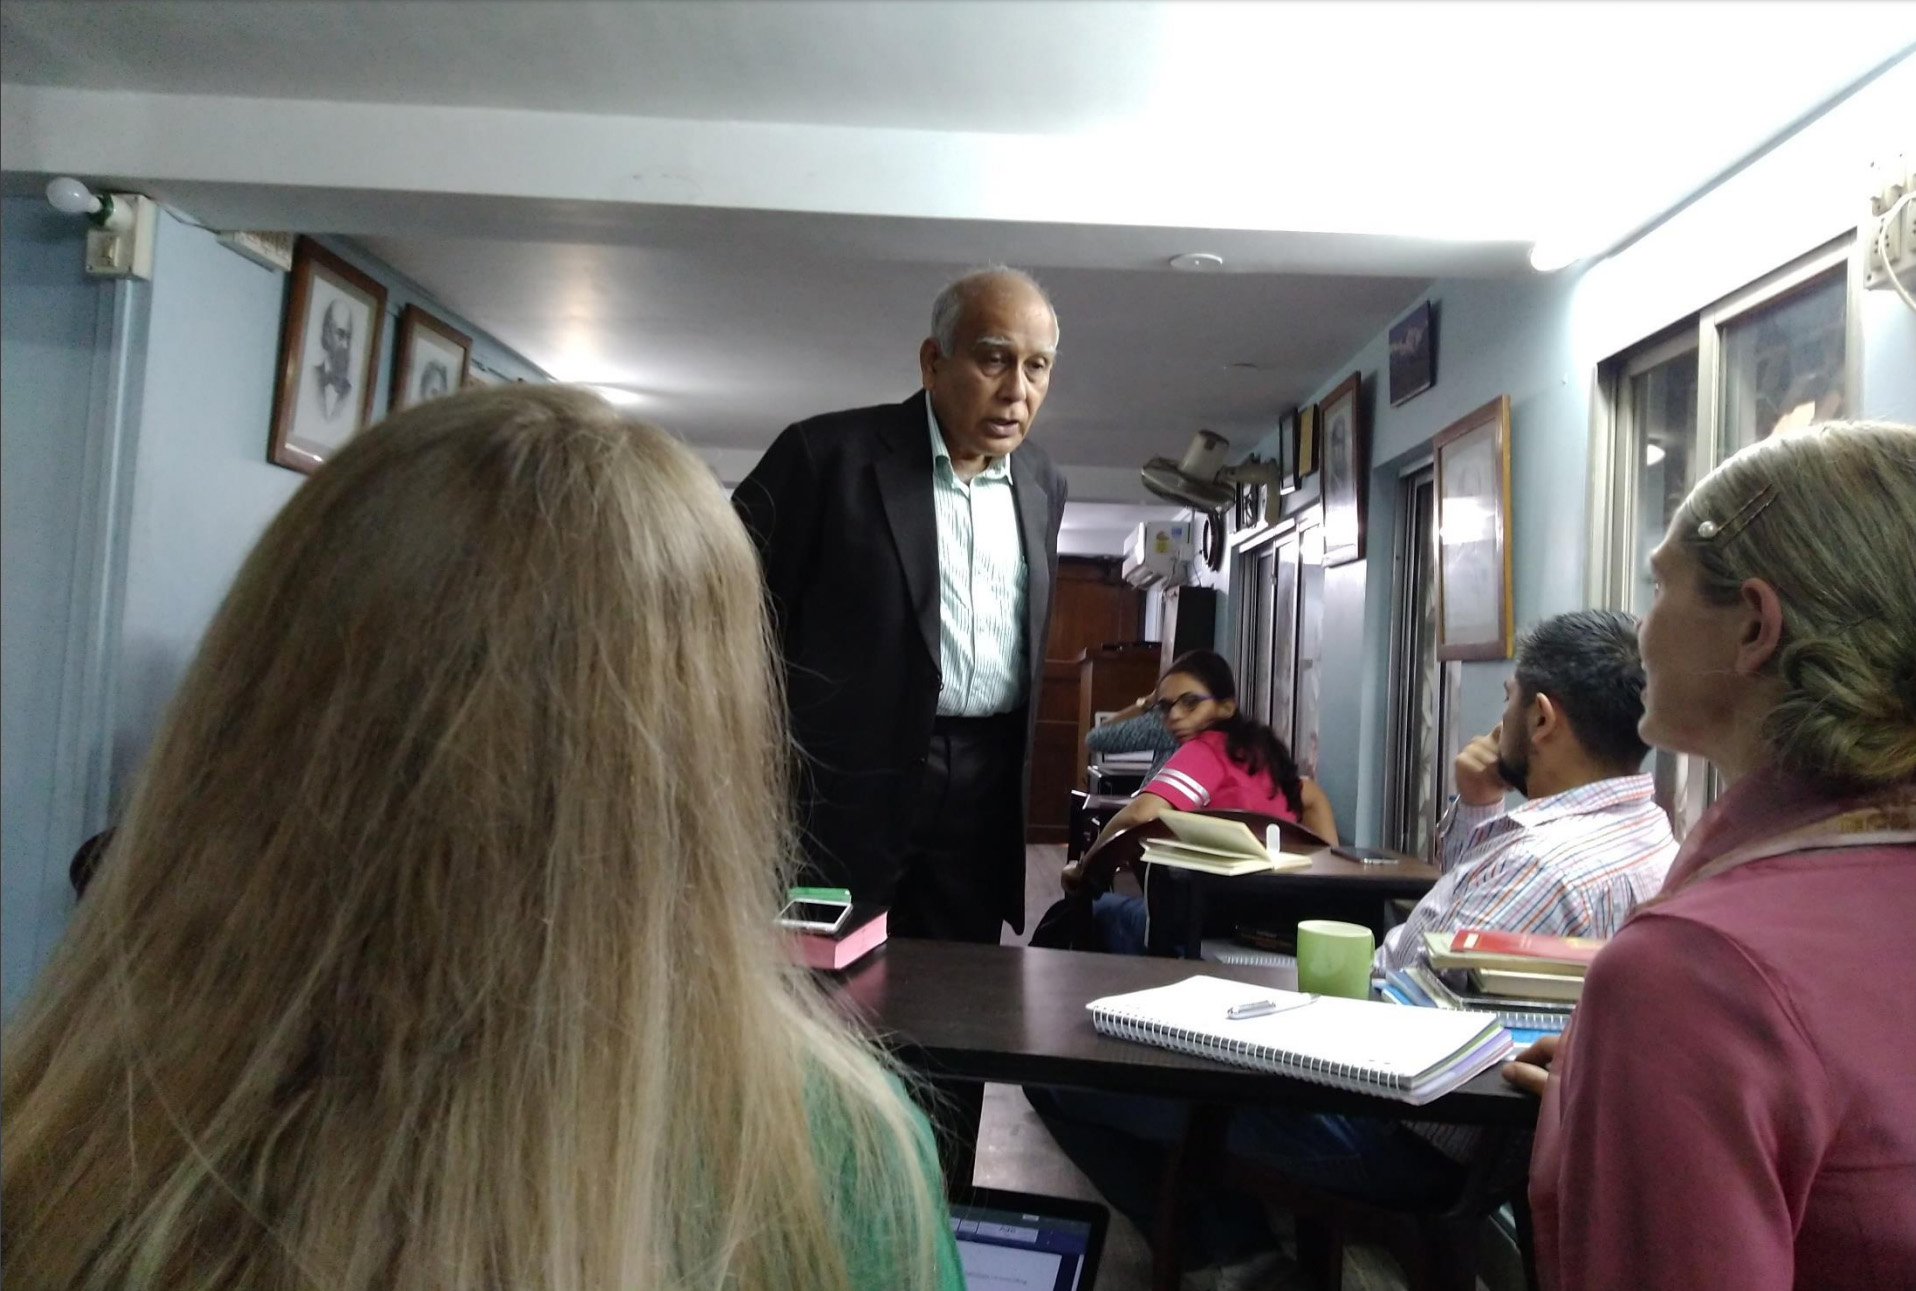 Dr. Debaish Mukherjee sharing his long experience with LMs